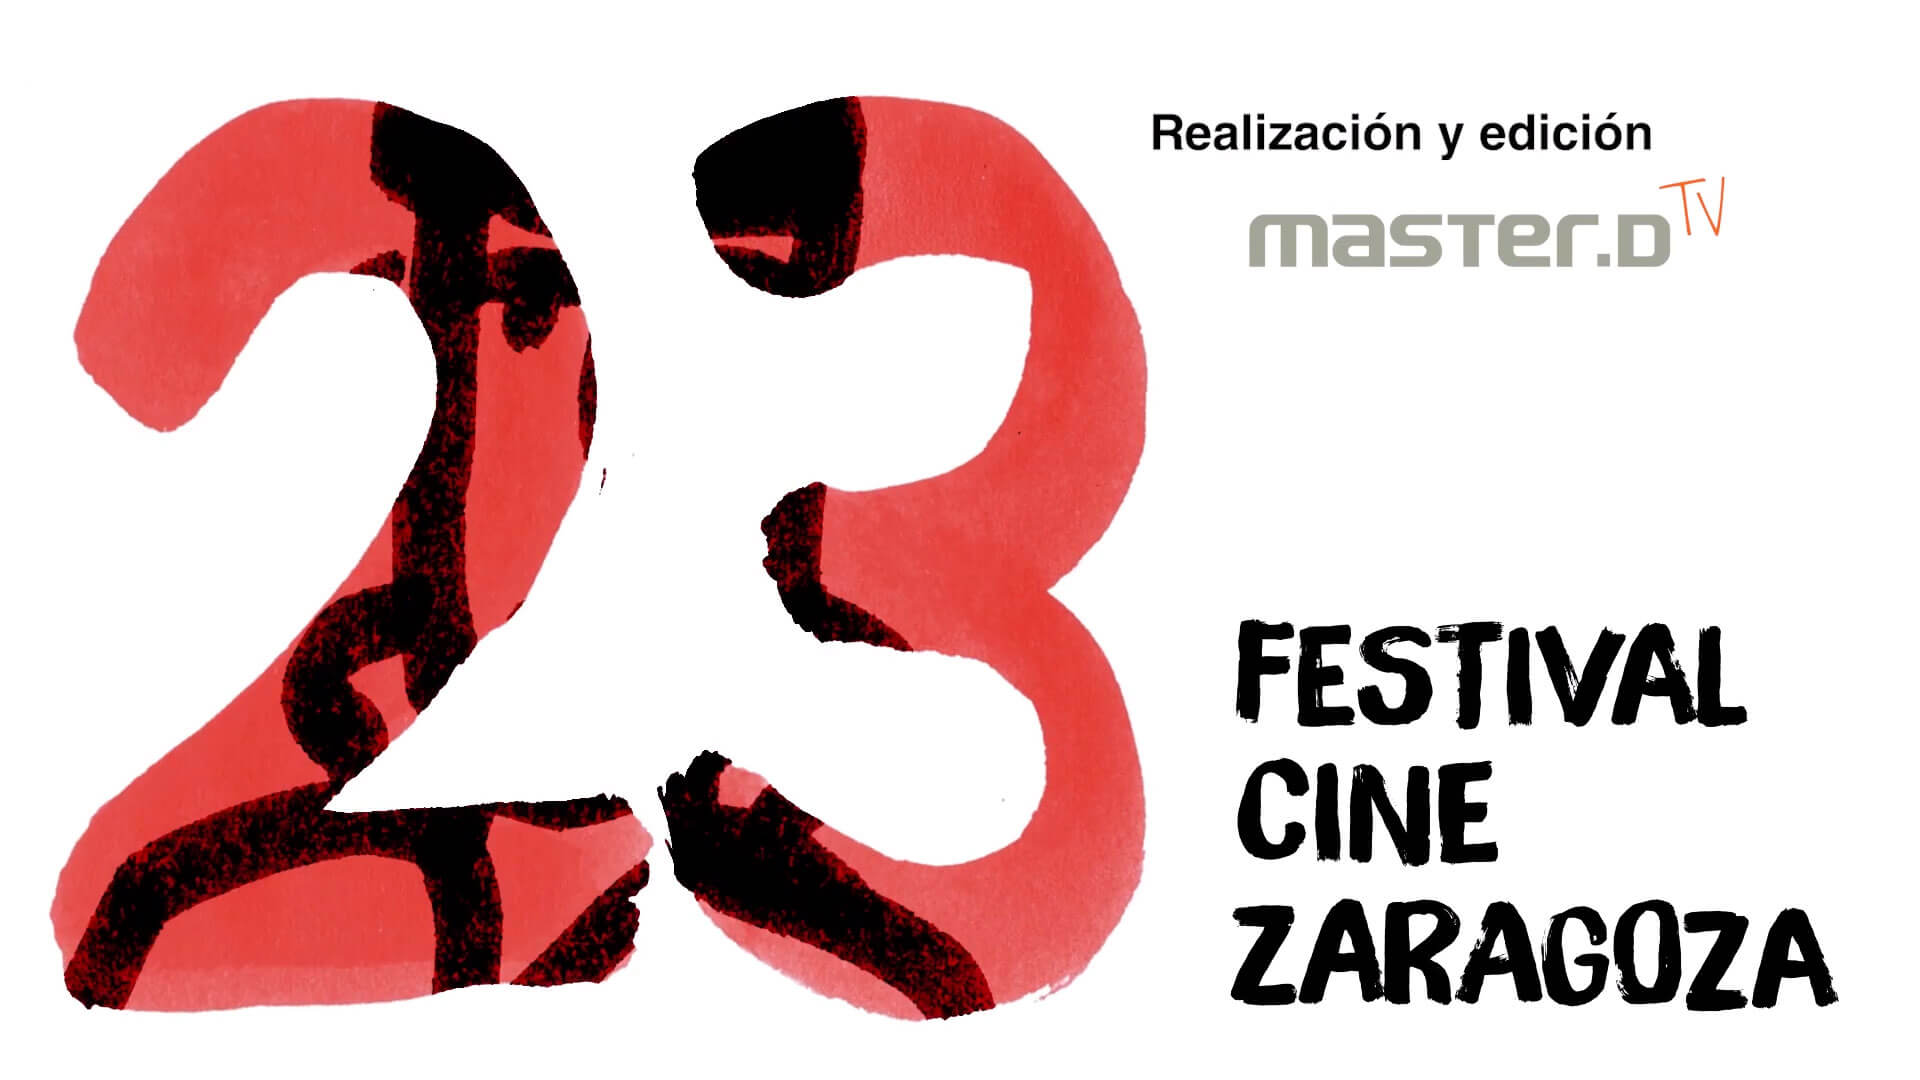 Emisión Festival Cine Zaragoza